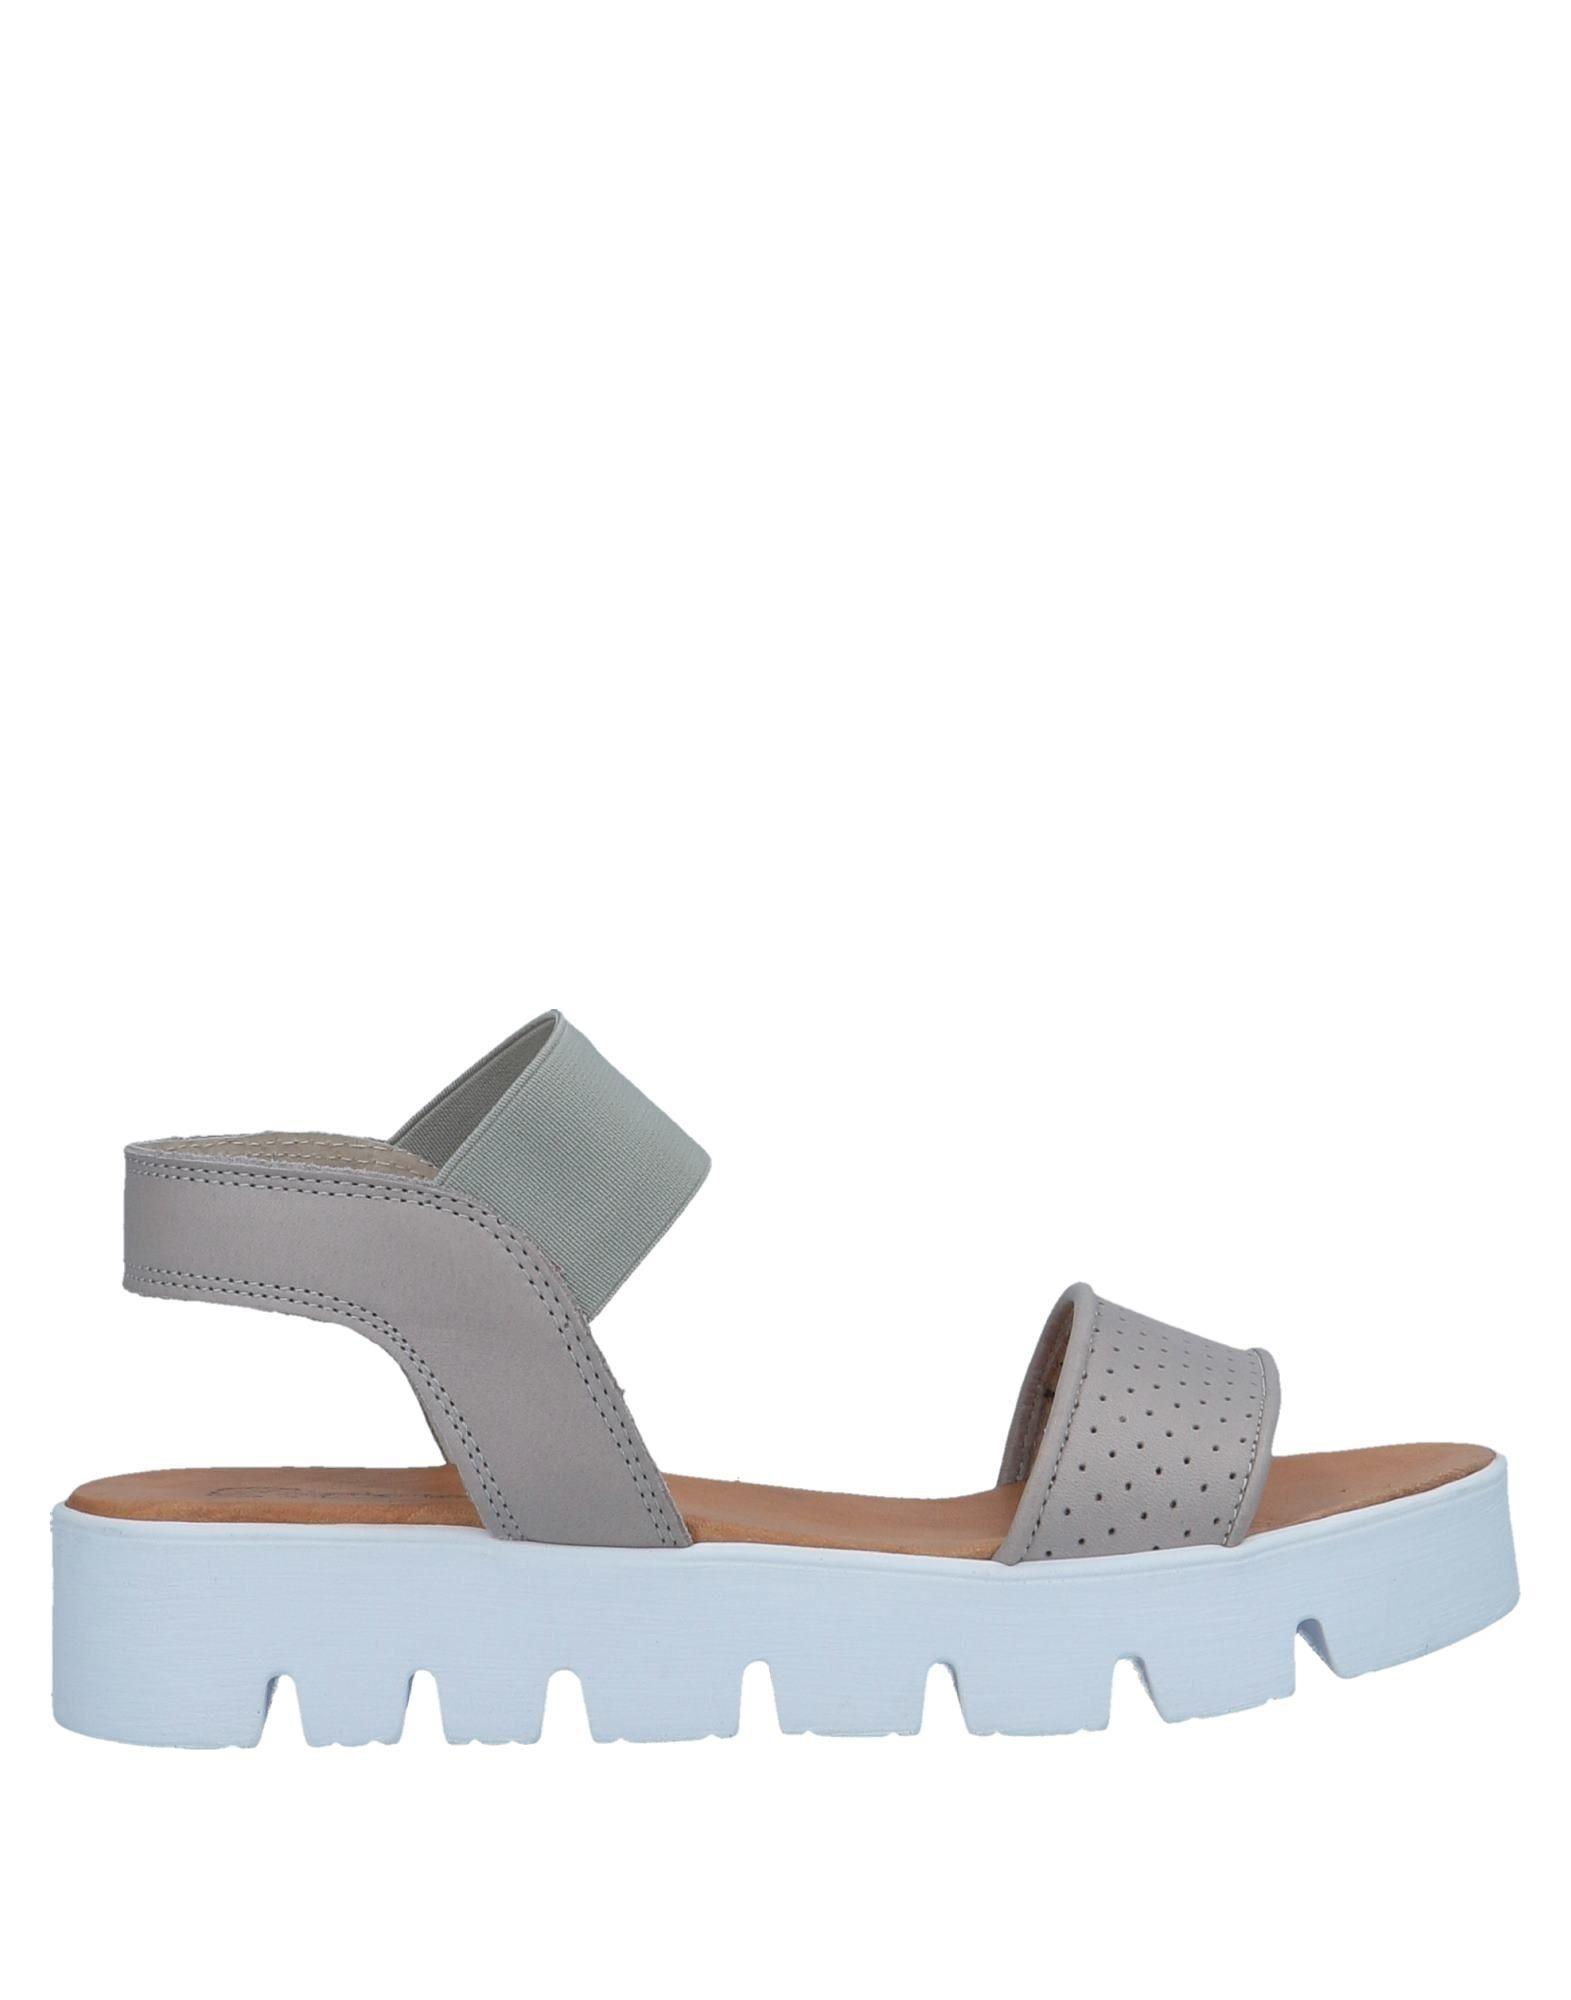 Piampiani Sandals - Women Piampiani  Sandals online on  Piampiani Canada - 11571289XC d79c4e